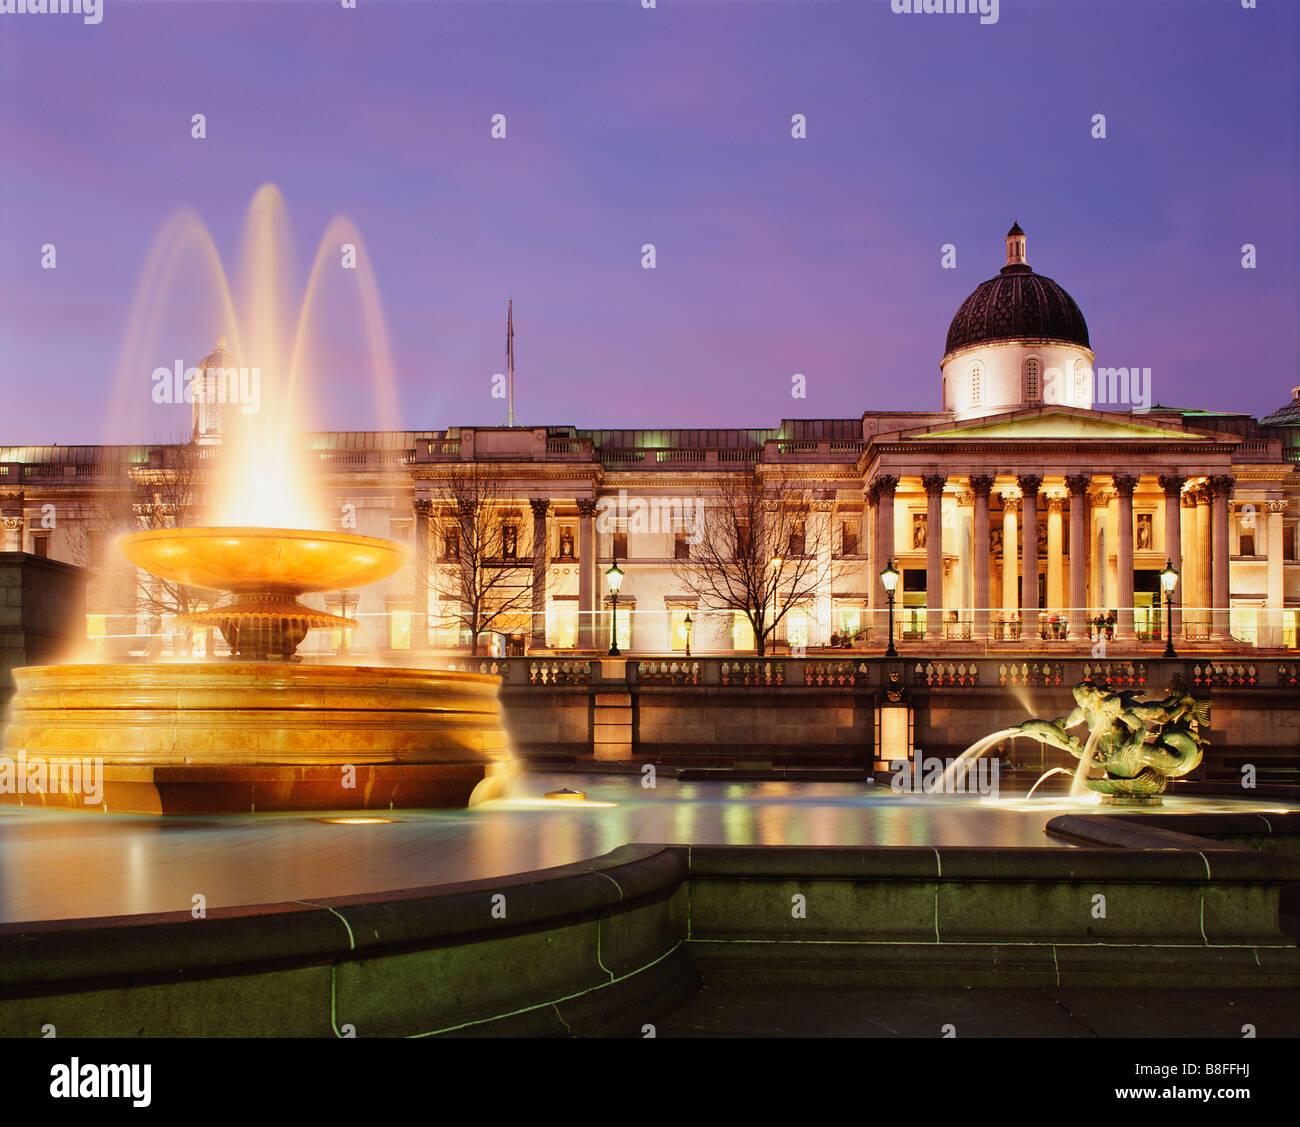 GB LONDON TRAFALGAR SQUARE NATIONAL GALLERY FOUNTAIN - Stock Image